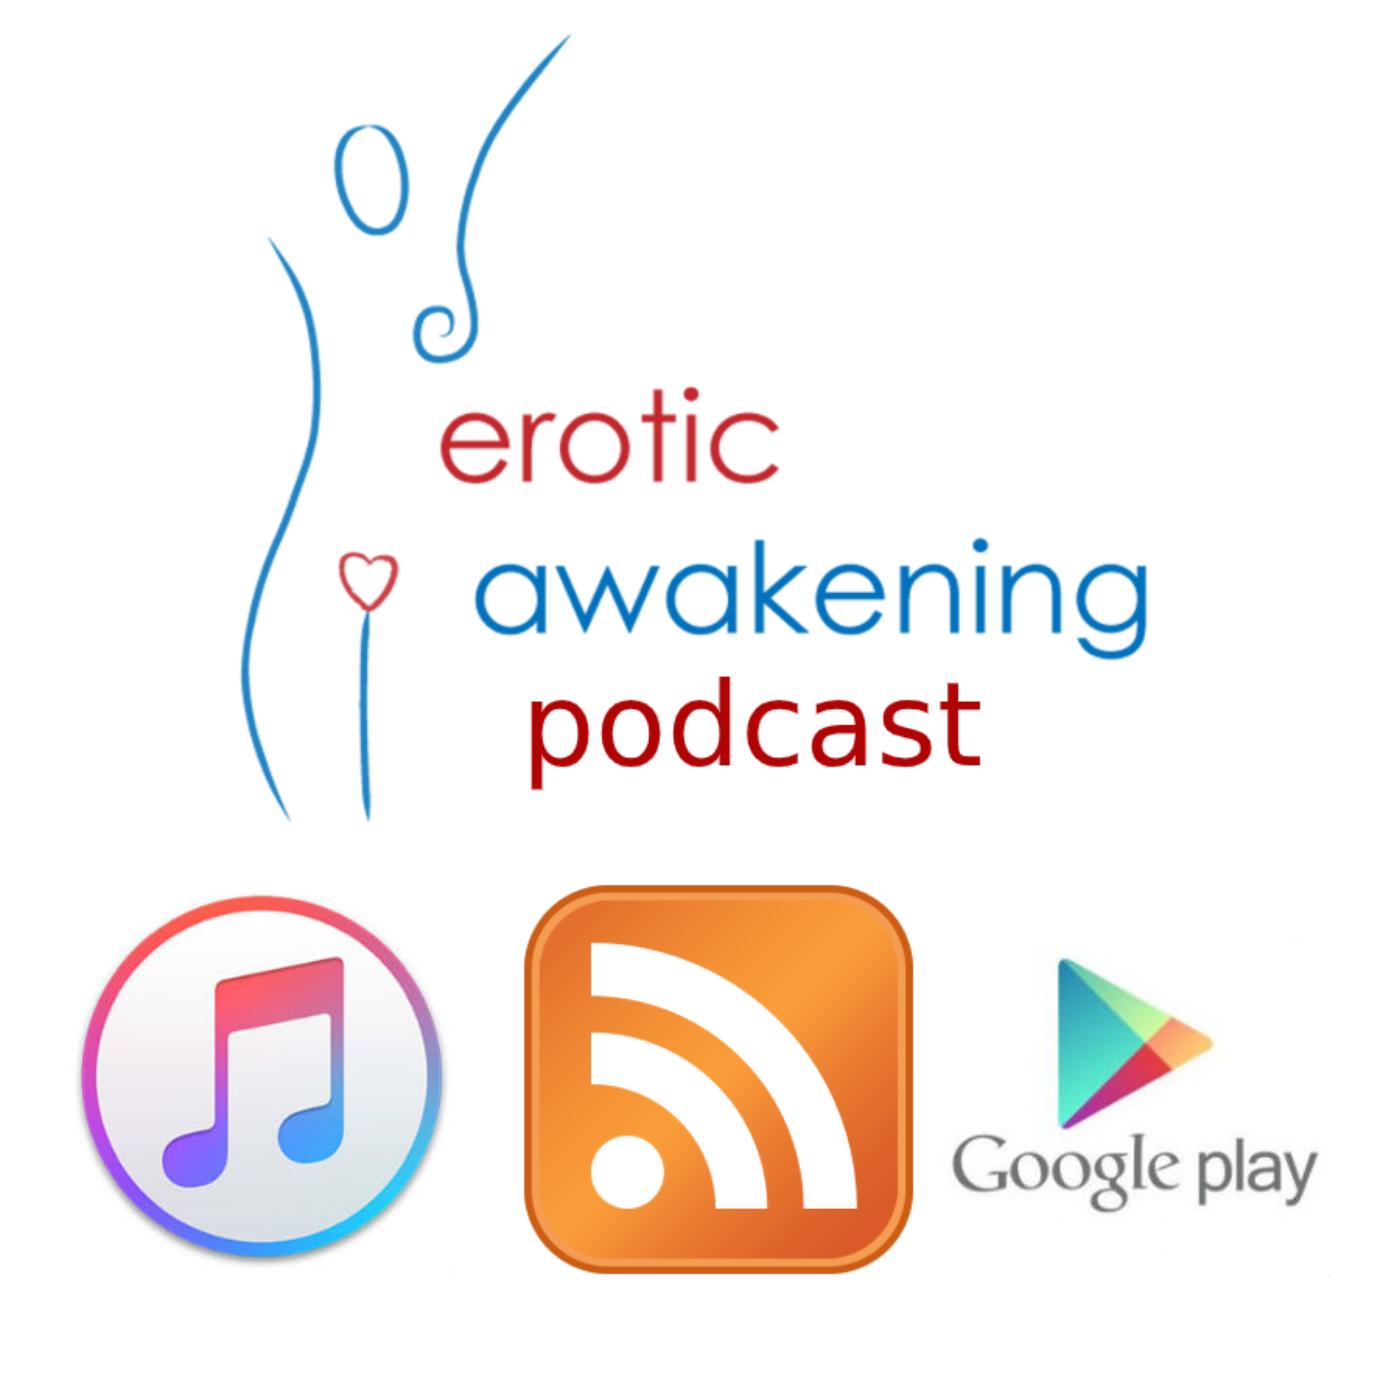 Erotic Awakening Podcast - EA530 - Master Hank